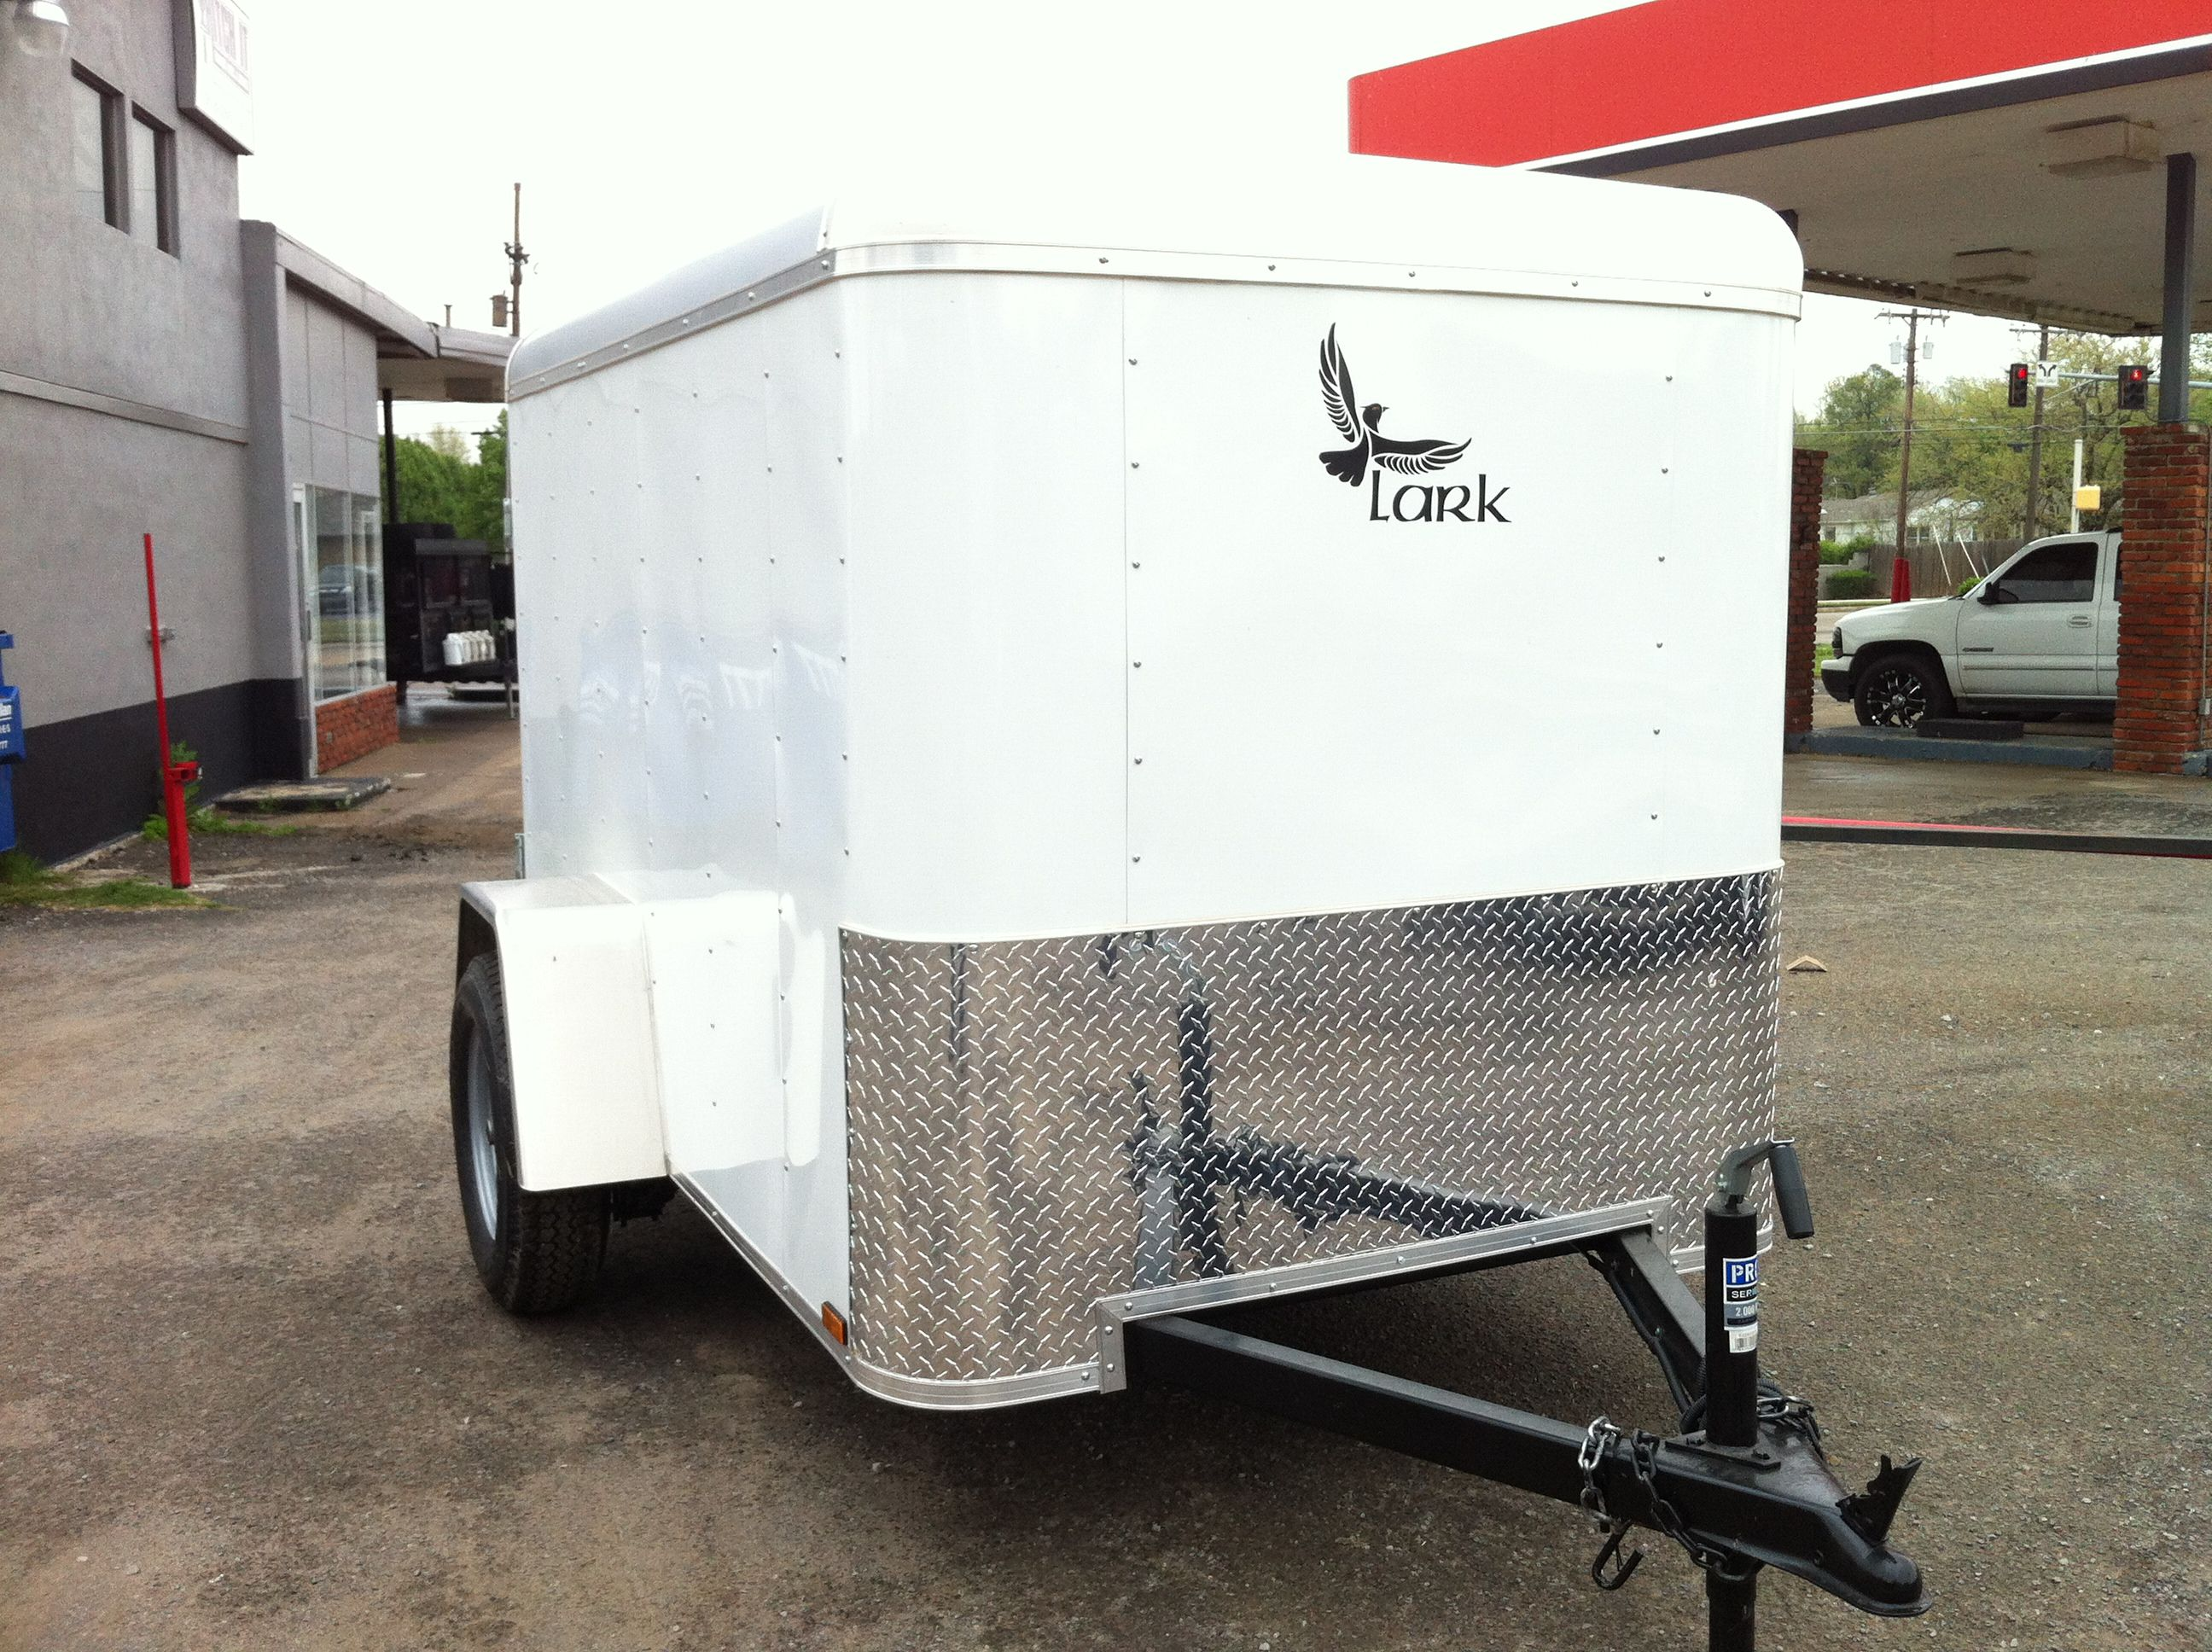 Hitch It Tulsa Area Trailer Sales Home Trailers For Sale Enclosed Cargo Trailers Cargo Trailers